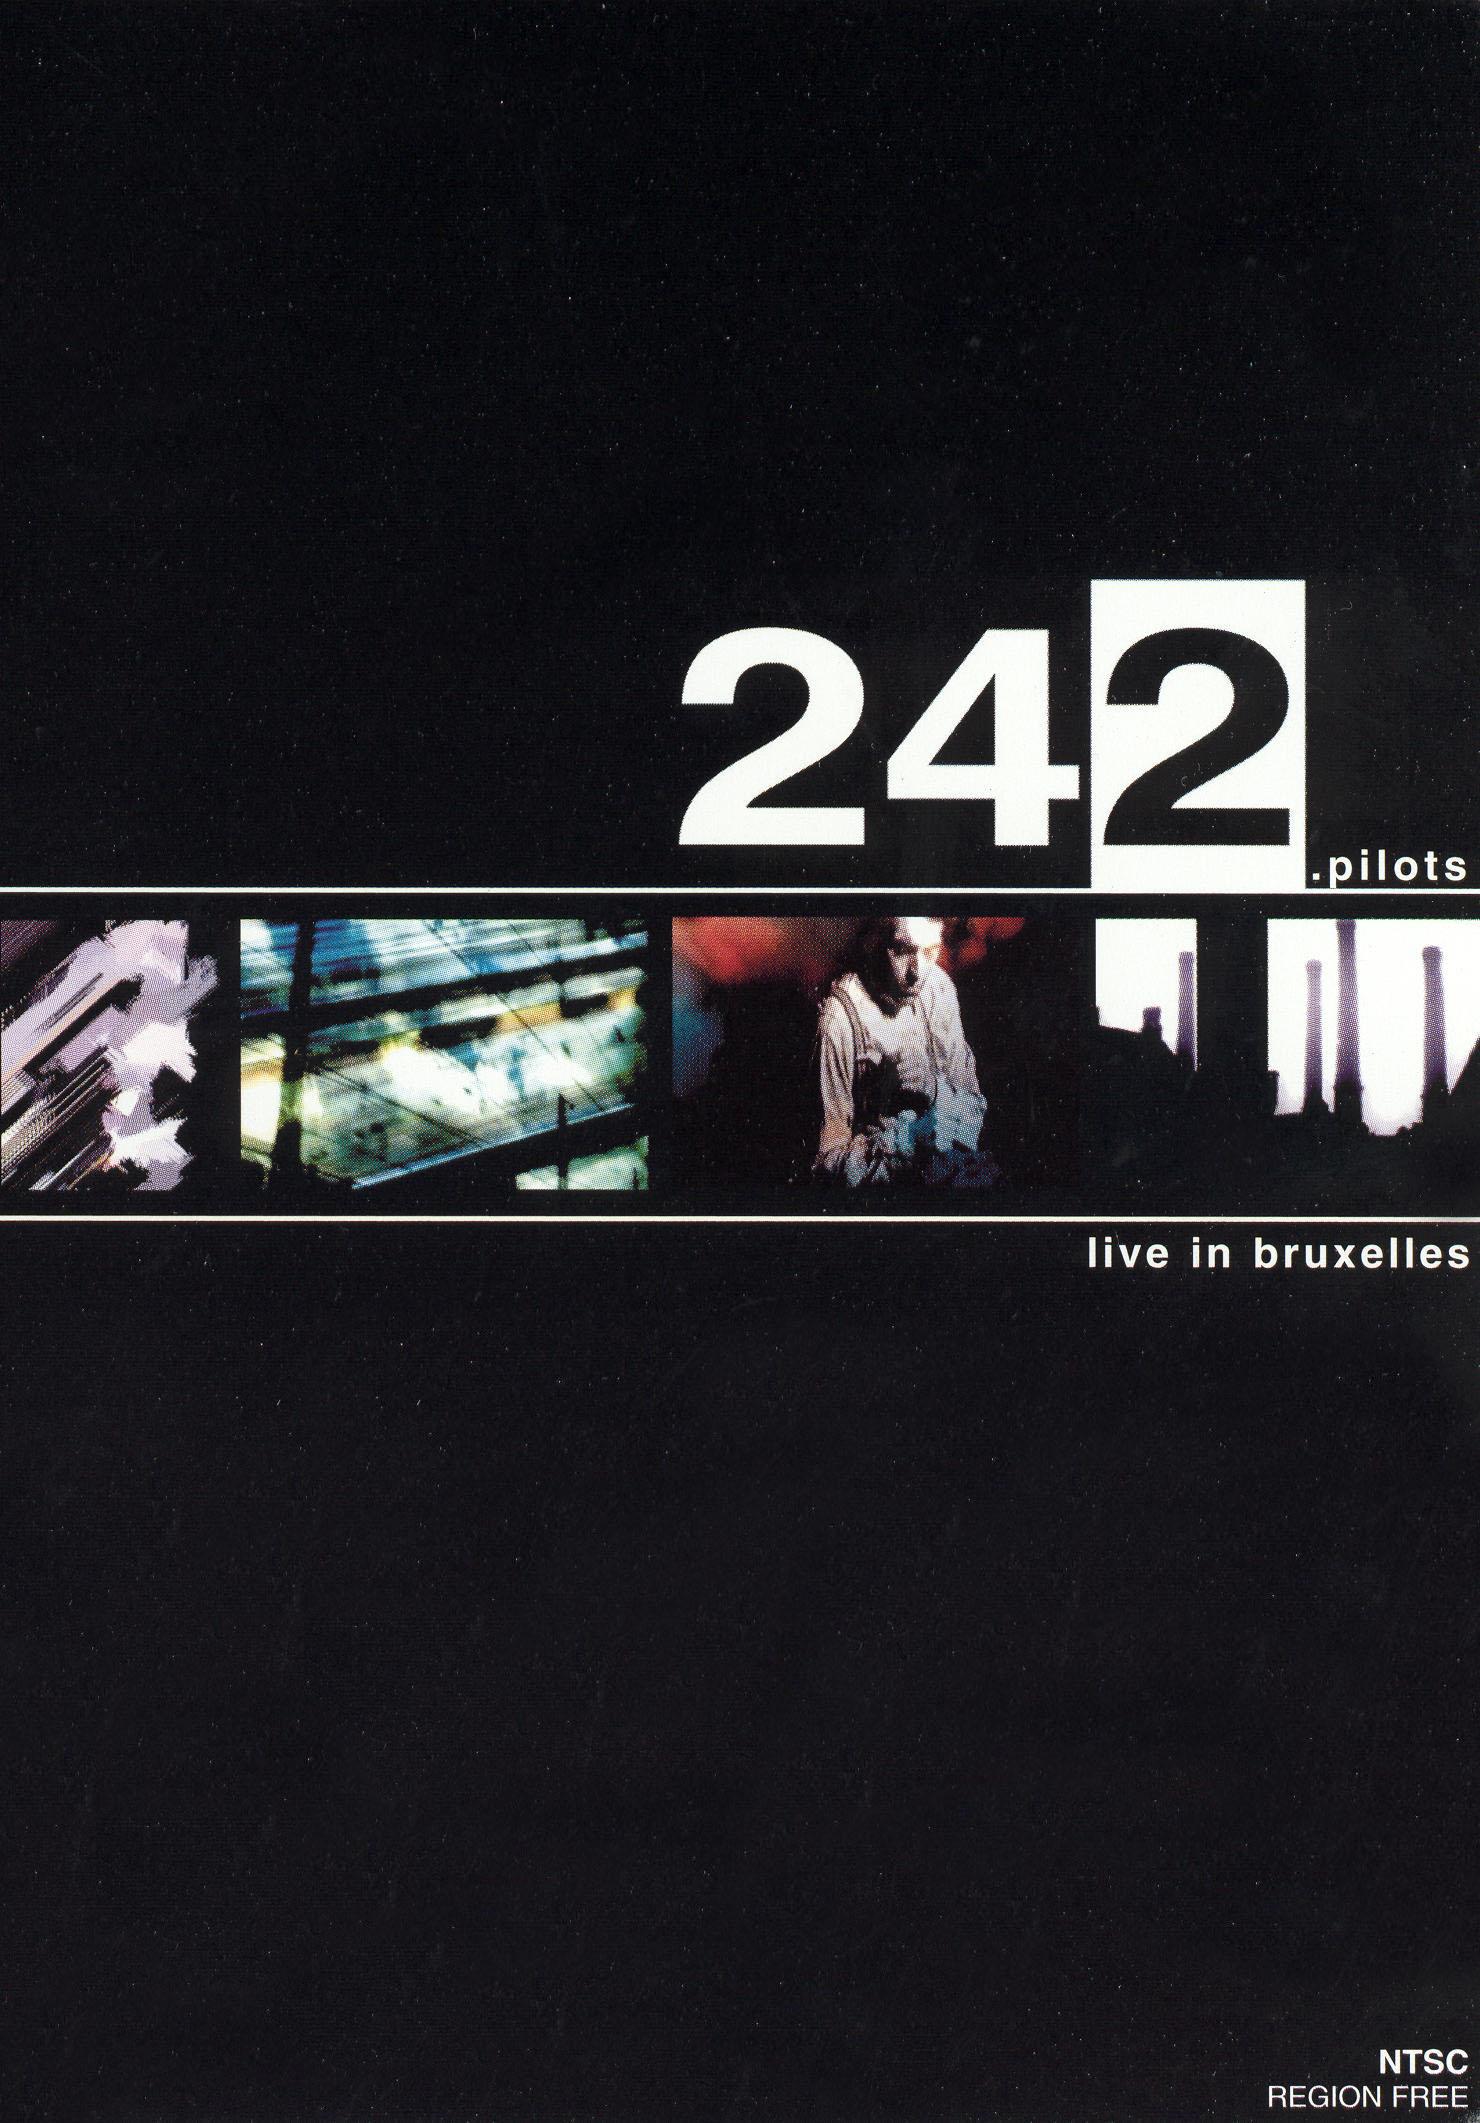 242.Pilots: Live in Bruxelles